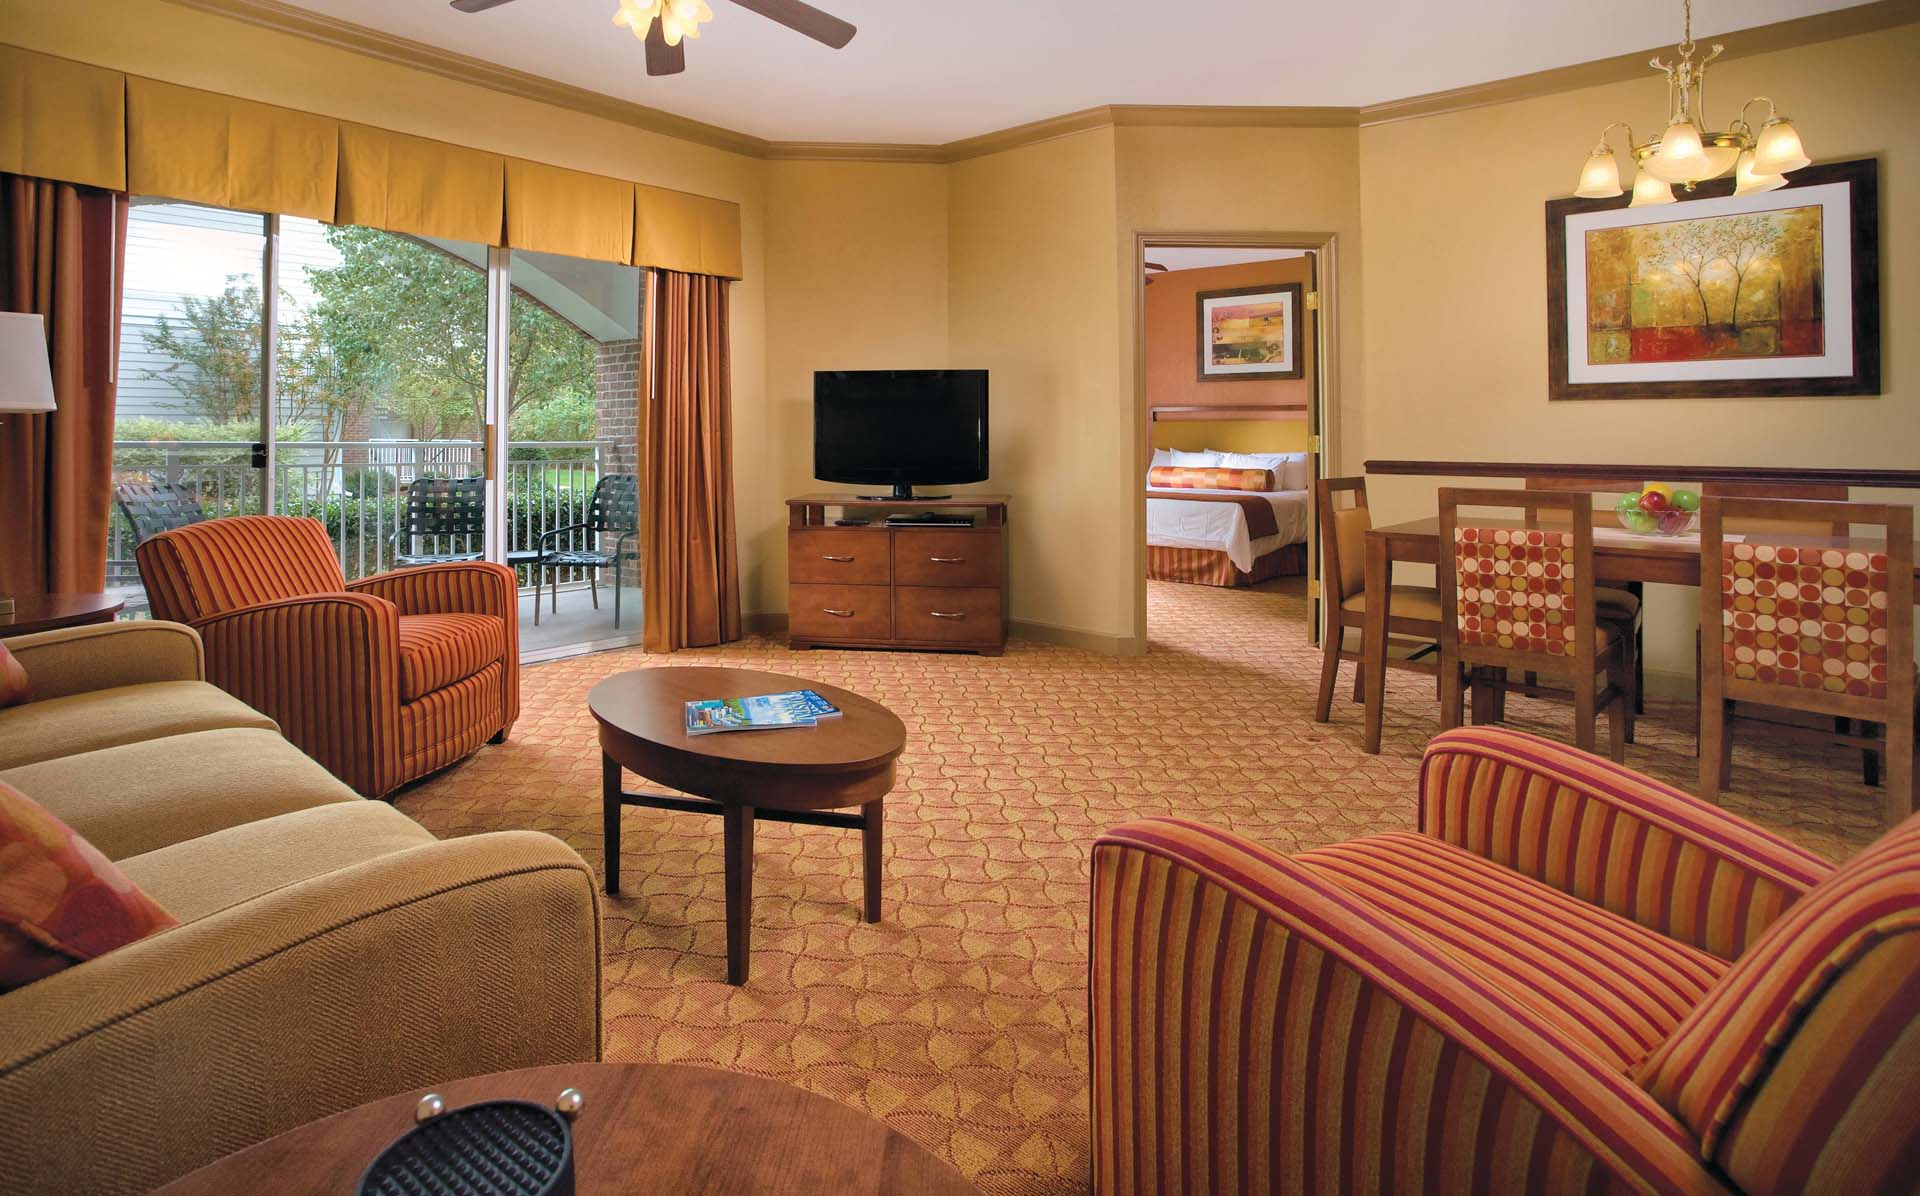 nashville lodging - tennessee resort suites